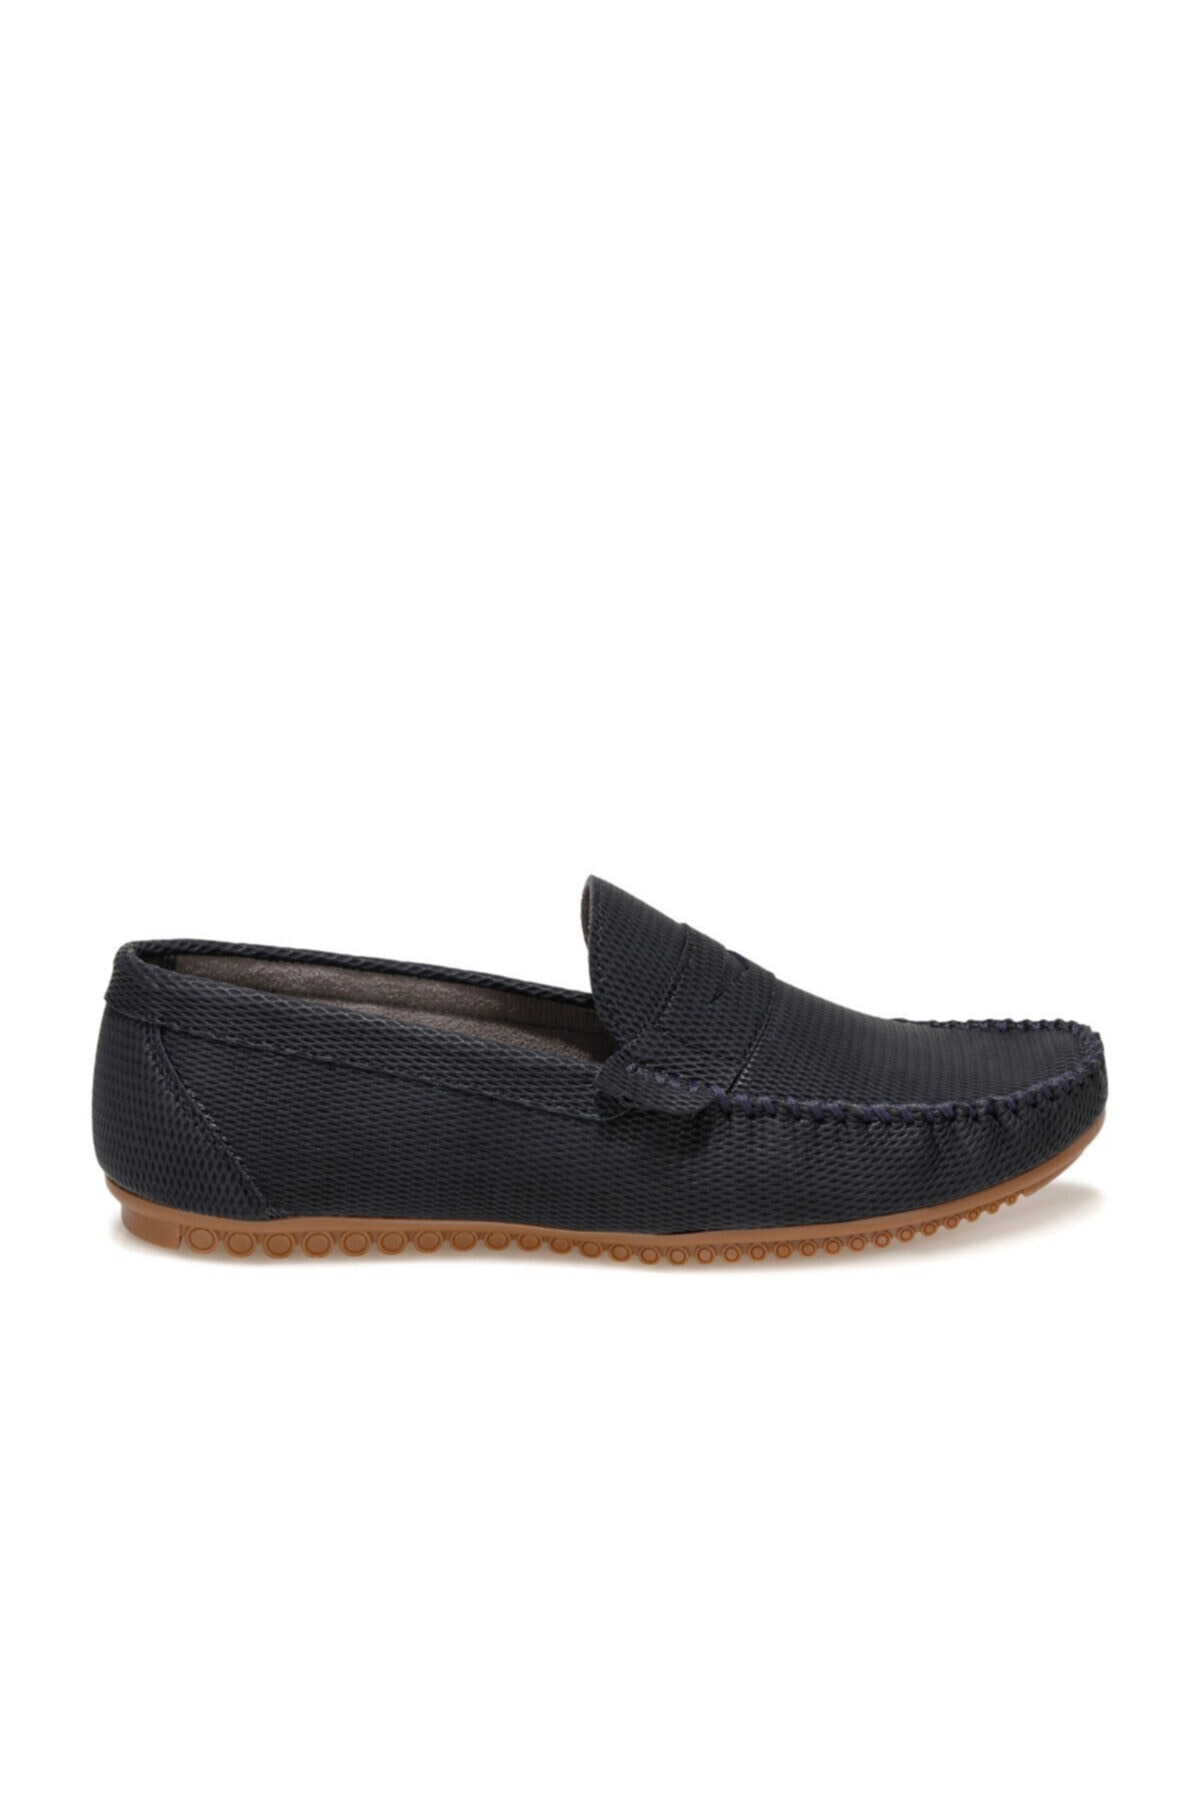 OXIDE MDL2 1FX Lacivert Erkek Loafer Ayakkabı 100910536 2